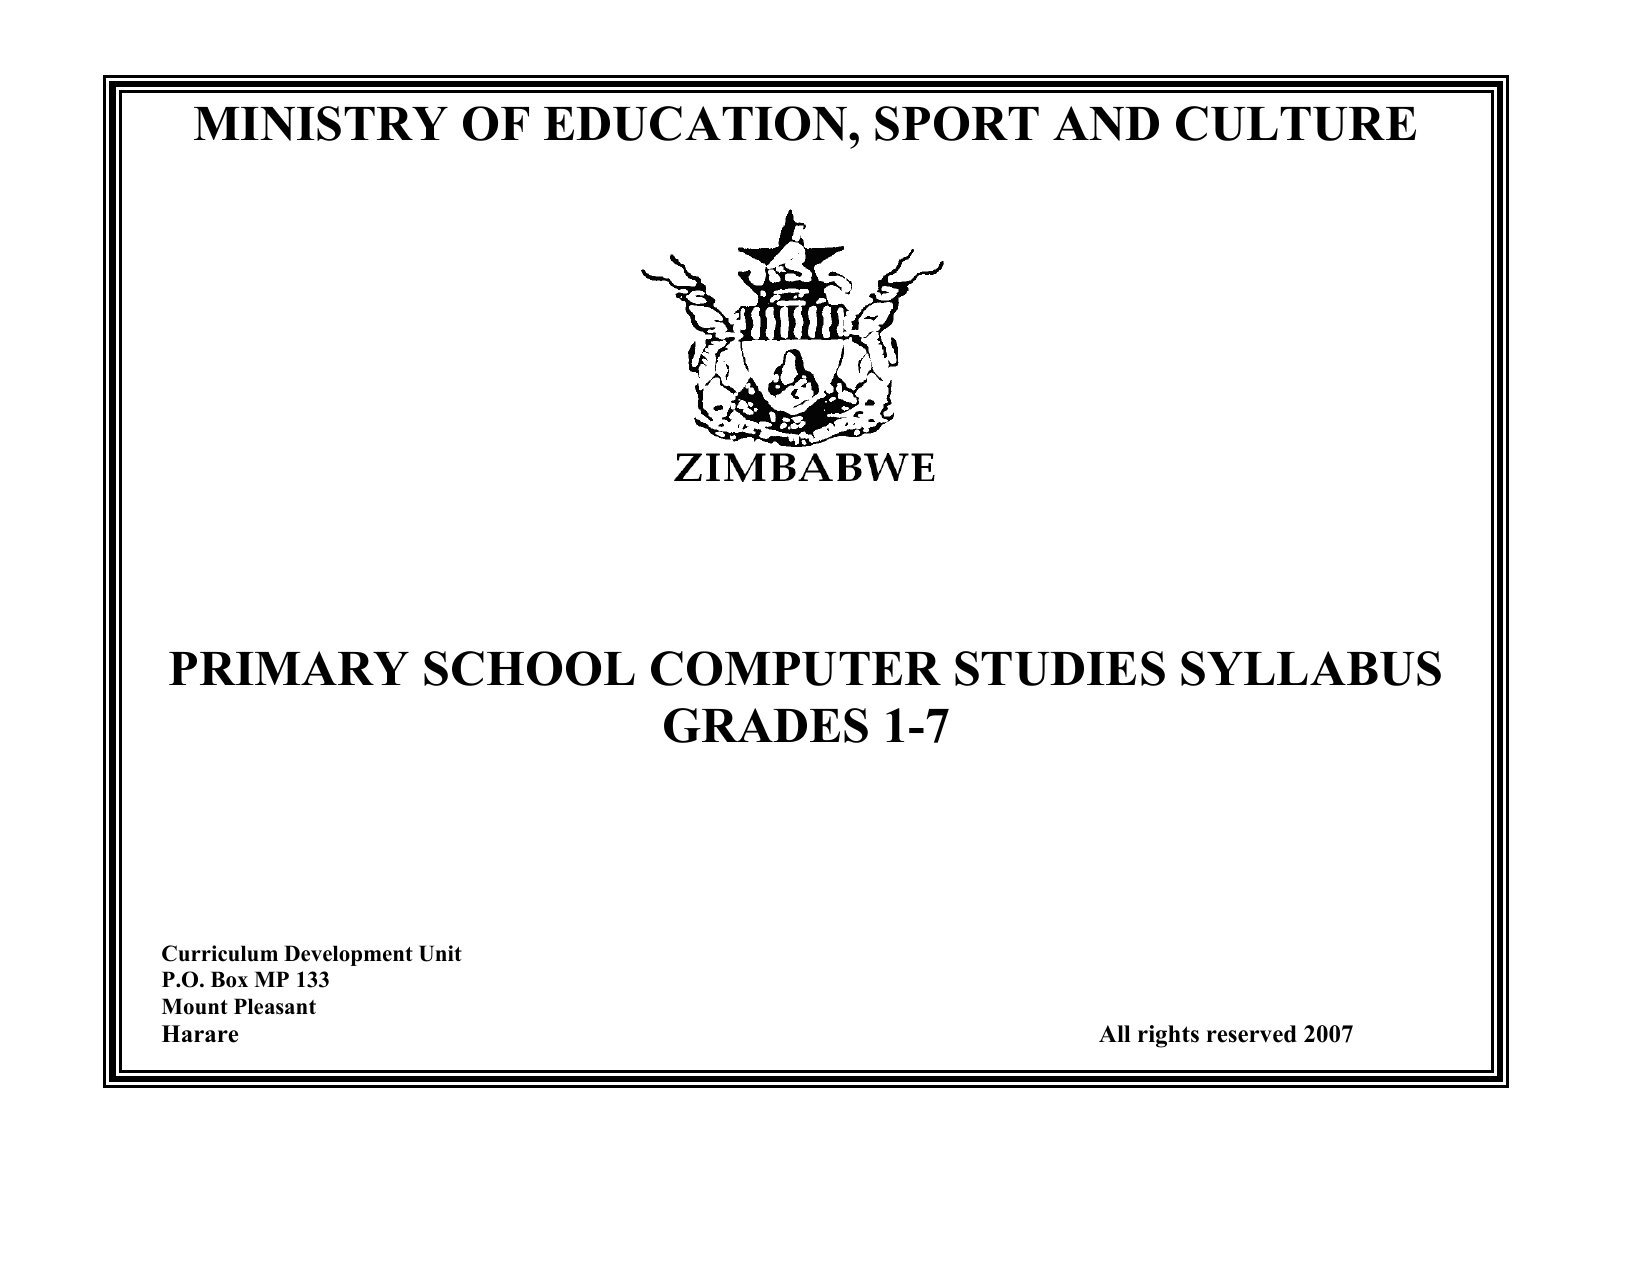 PRIMARY SCHOOL COMPUTER STUDIES SYLLABUS